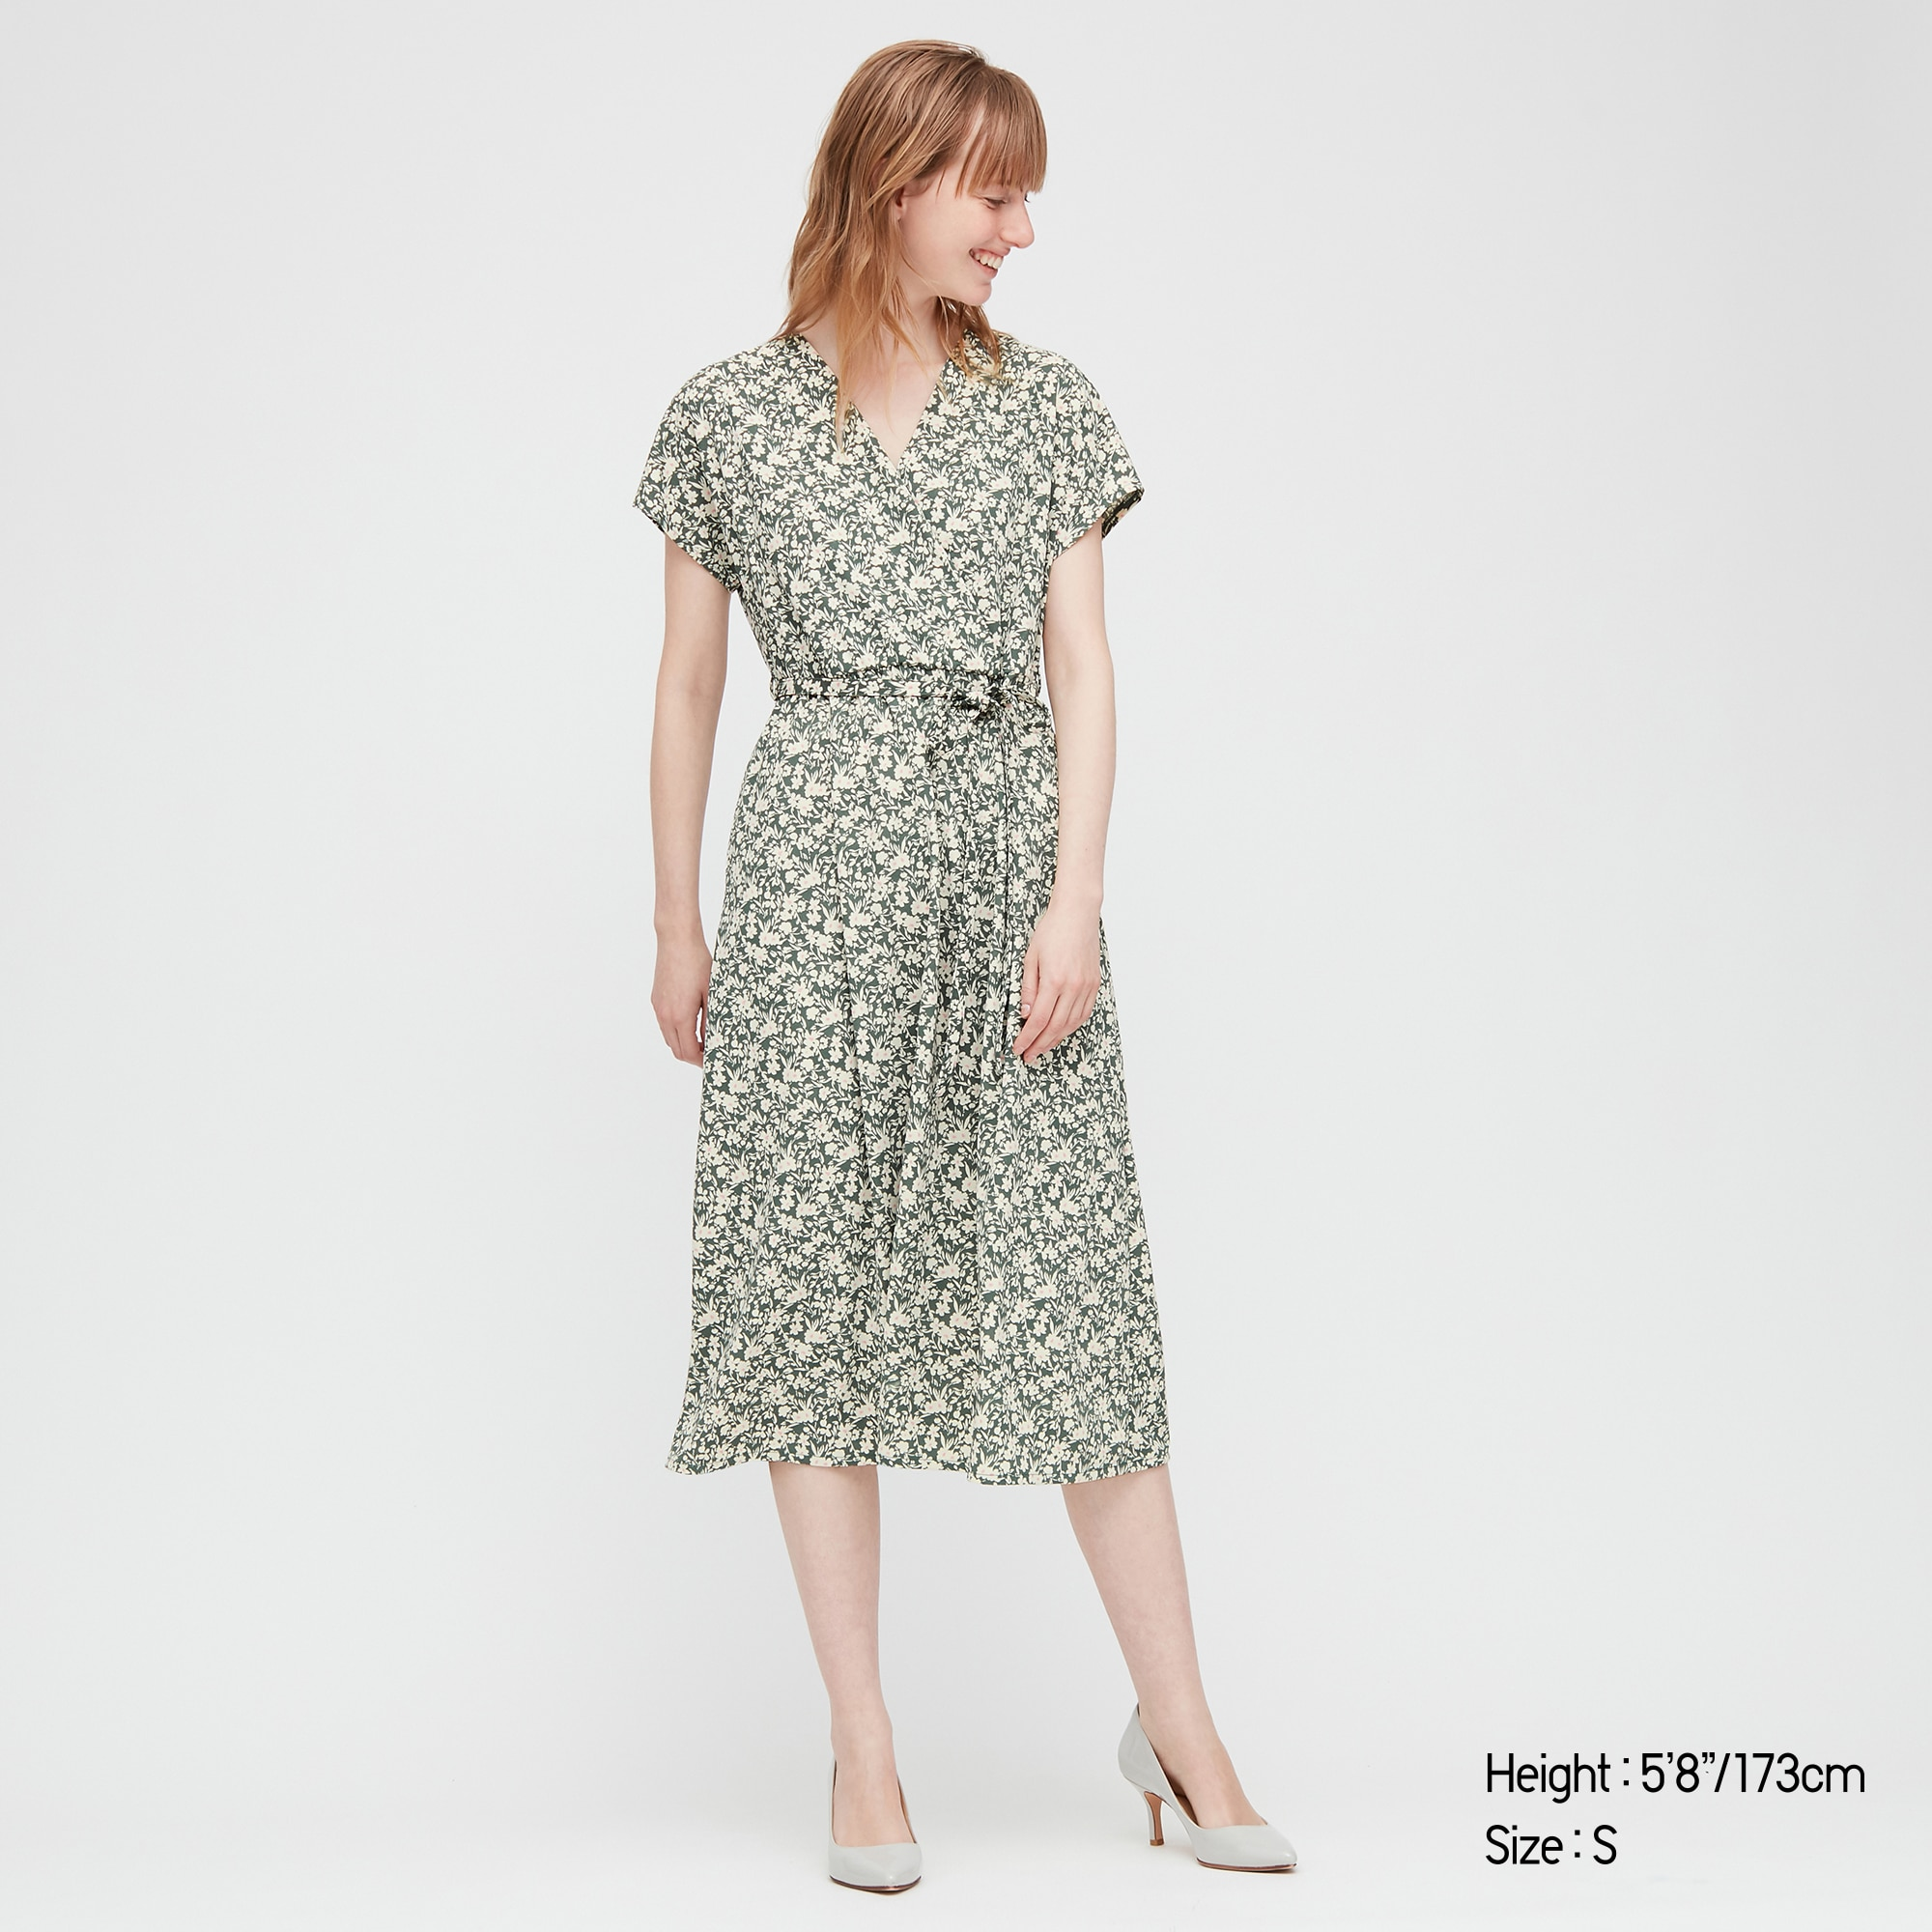 WOMEN JOY OF PRINT CREPE JERSEY WRAP DRESS